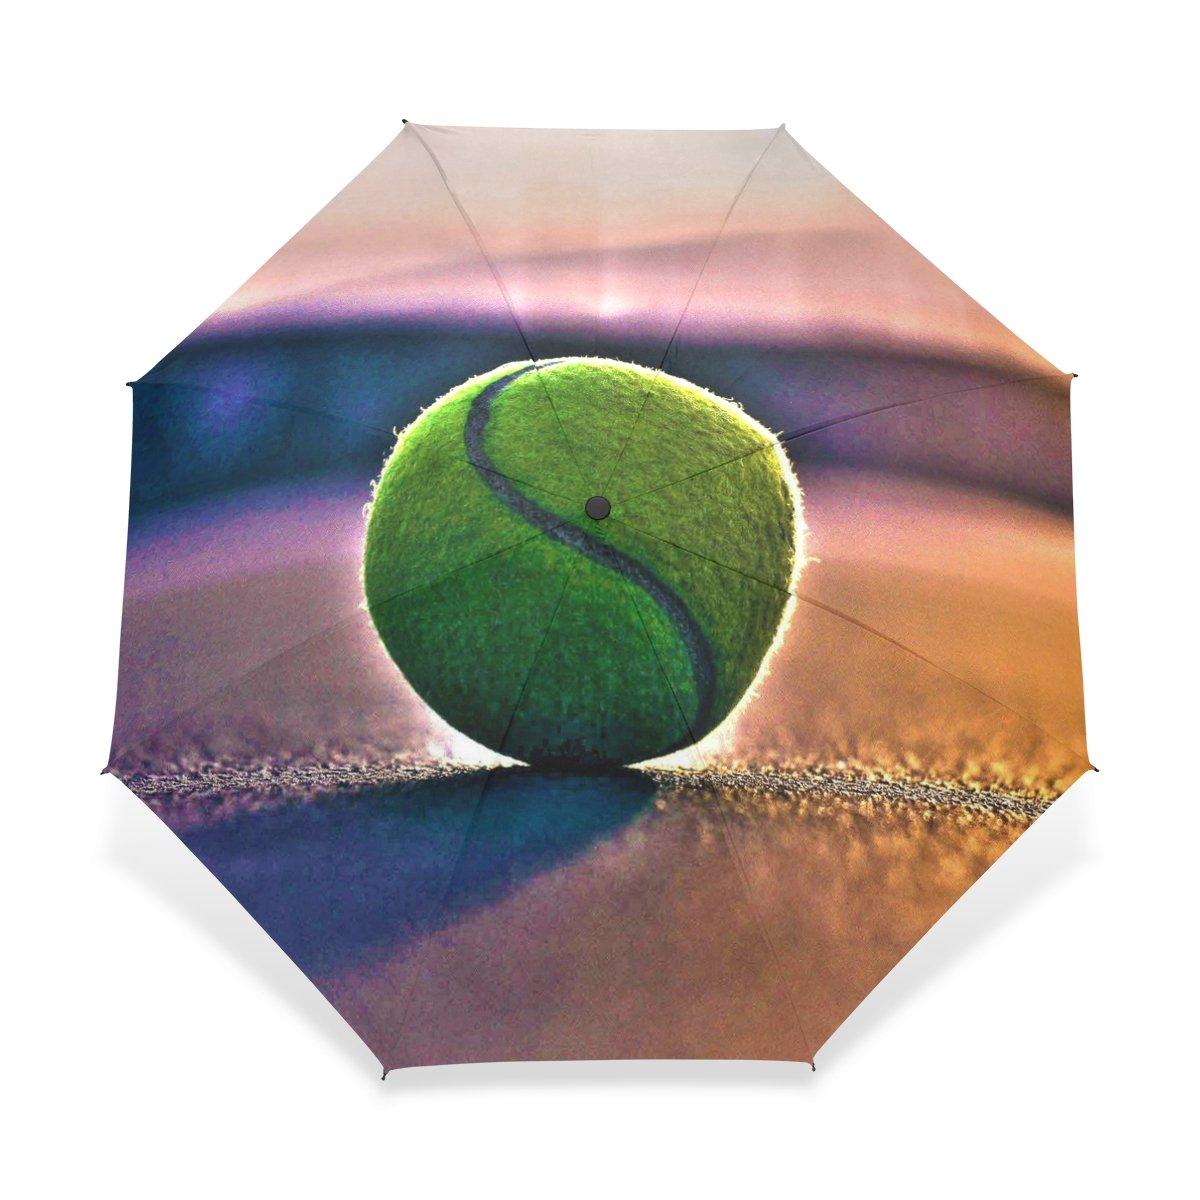 baihuishop防風ゴルフ傘、コンパクトで旅行for Easy Carryingスポーツ雨傘 – 強力なフレーム壊れないテニスパターン   B01FXHAGJE